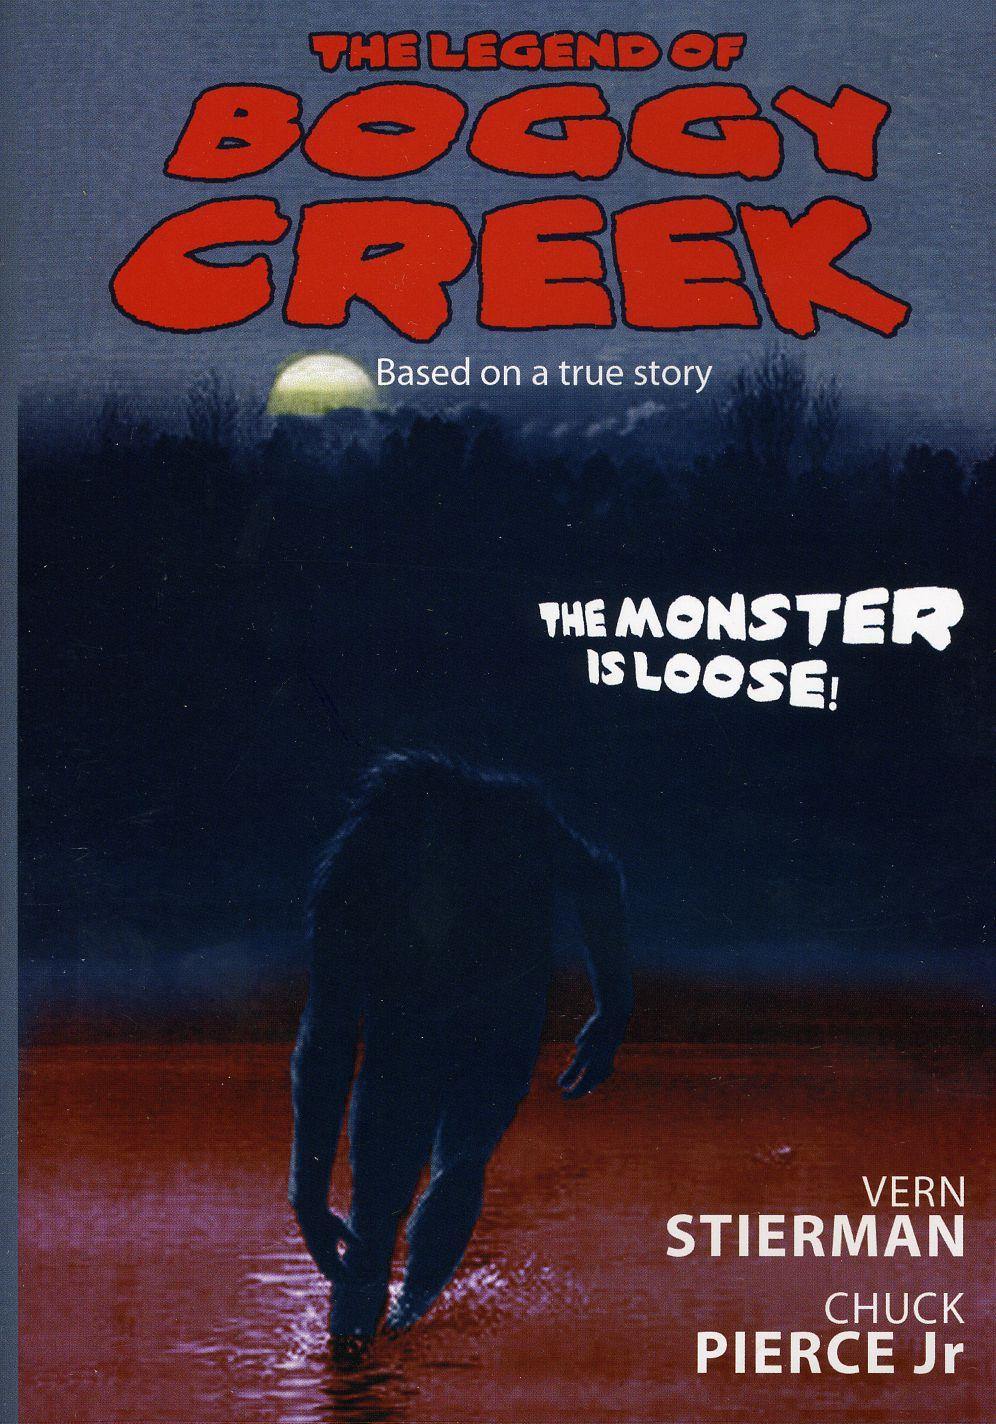 Legend of Boggy Creek (DVD)